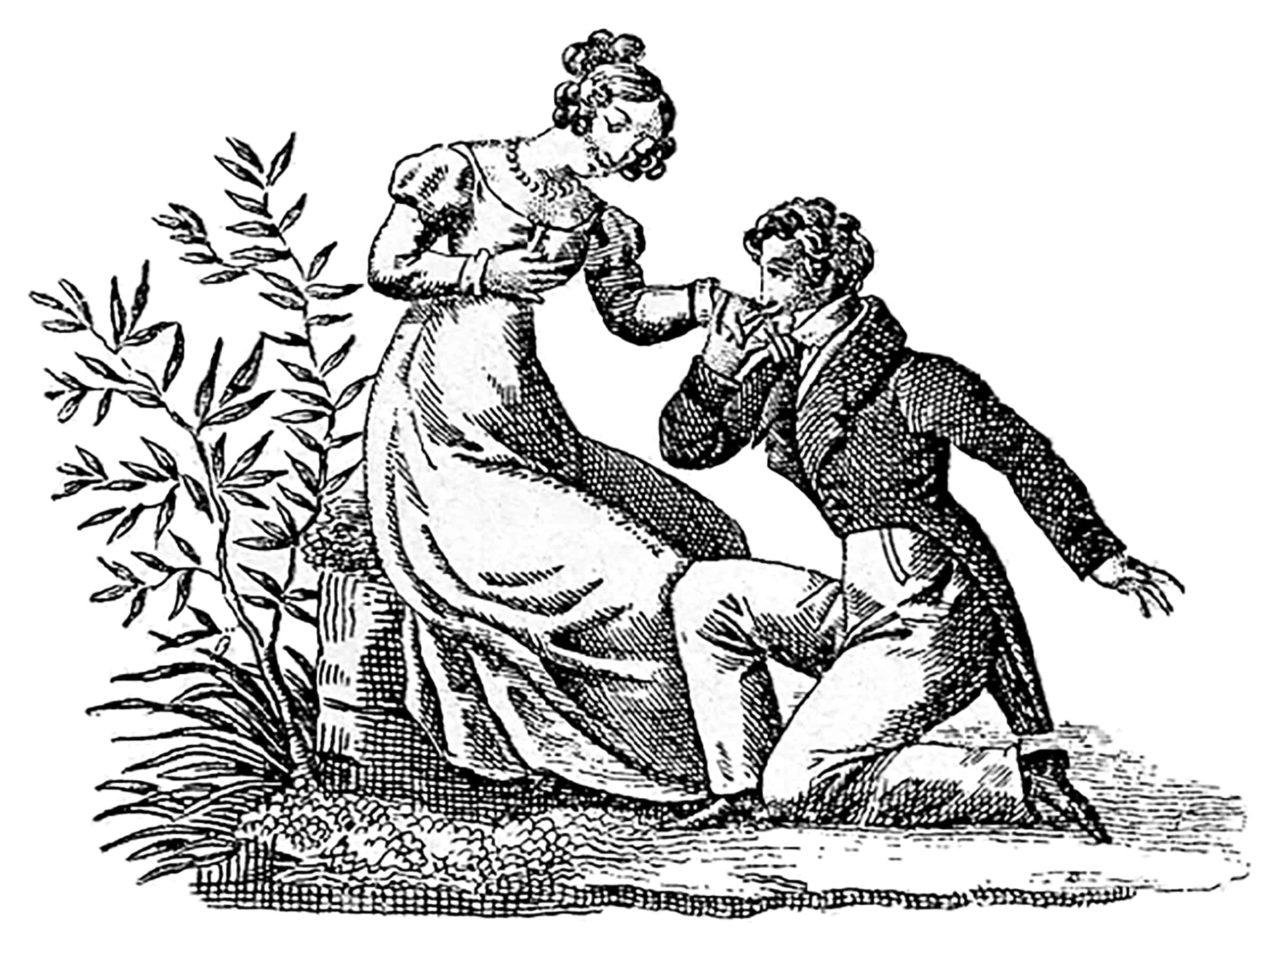 Move over Bridgerton: Here Come the Creators of Real Regency Romance